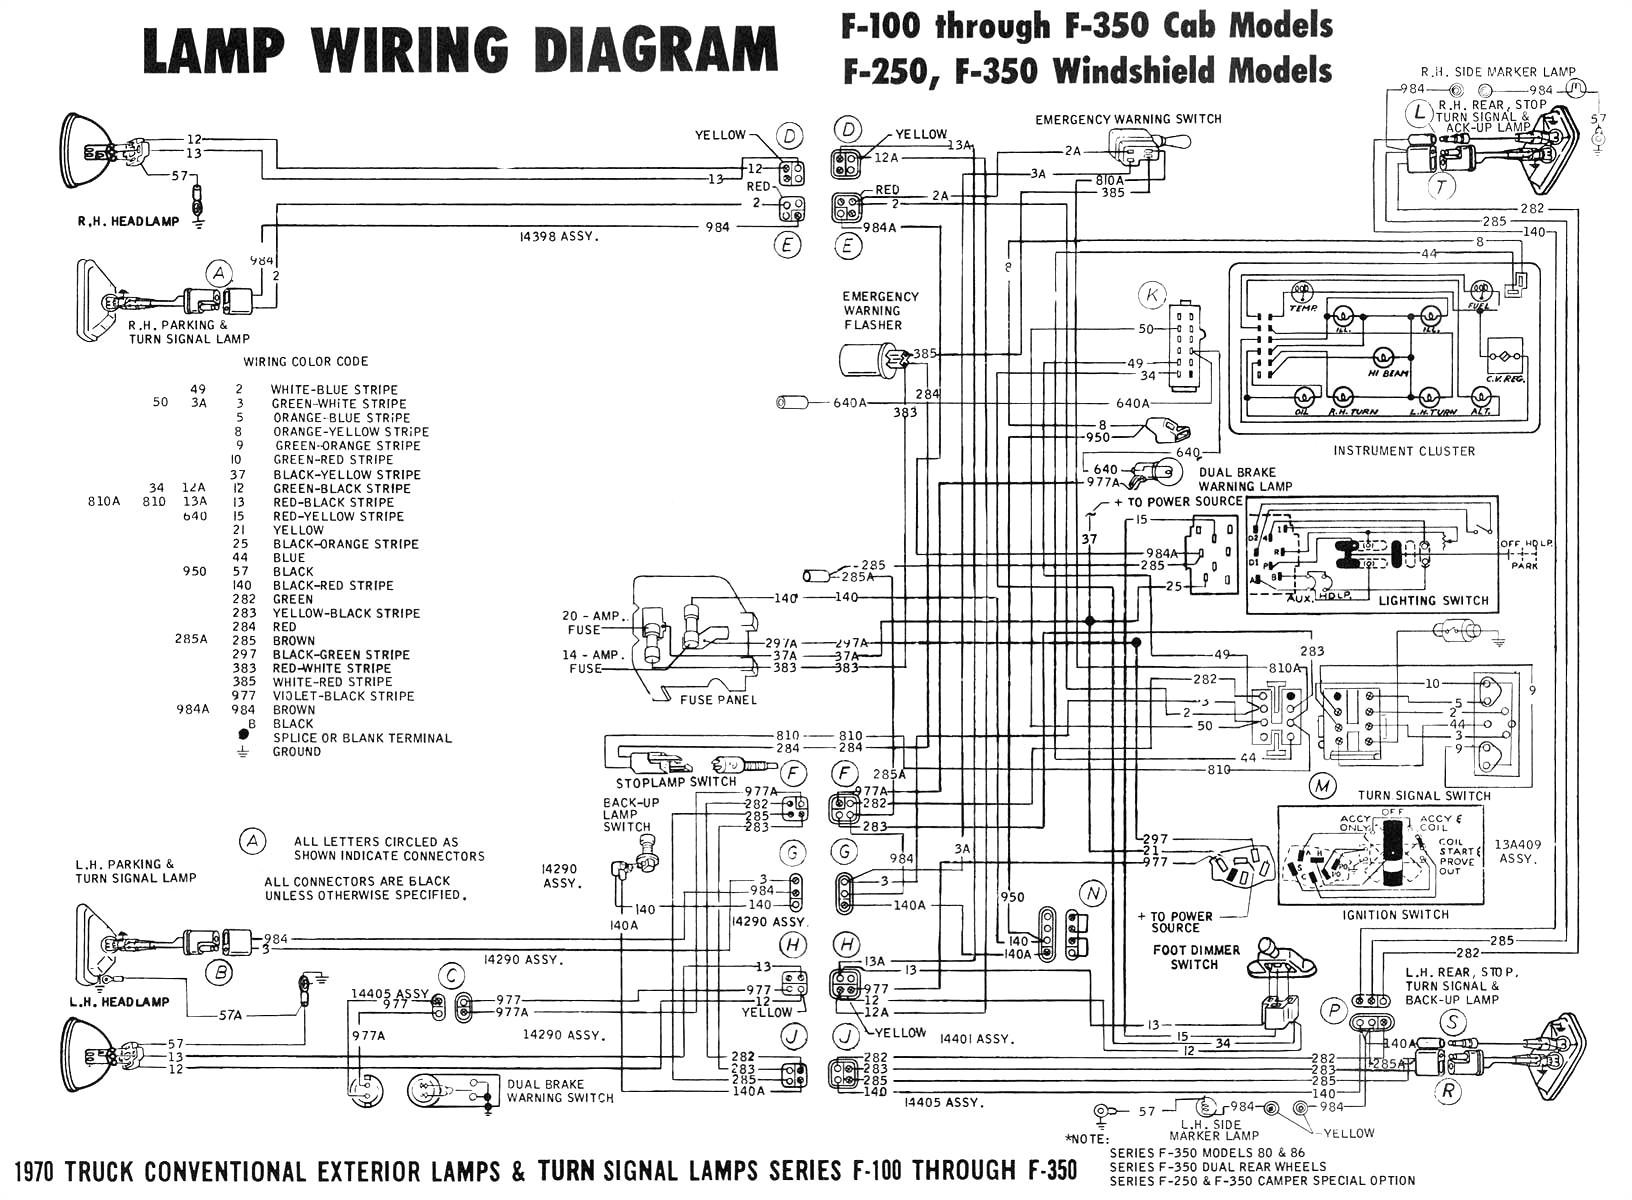 schematic wiring diagram ach 088 wiring diagram review ach wiring diagram model 8